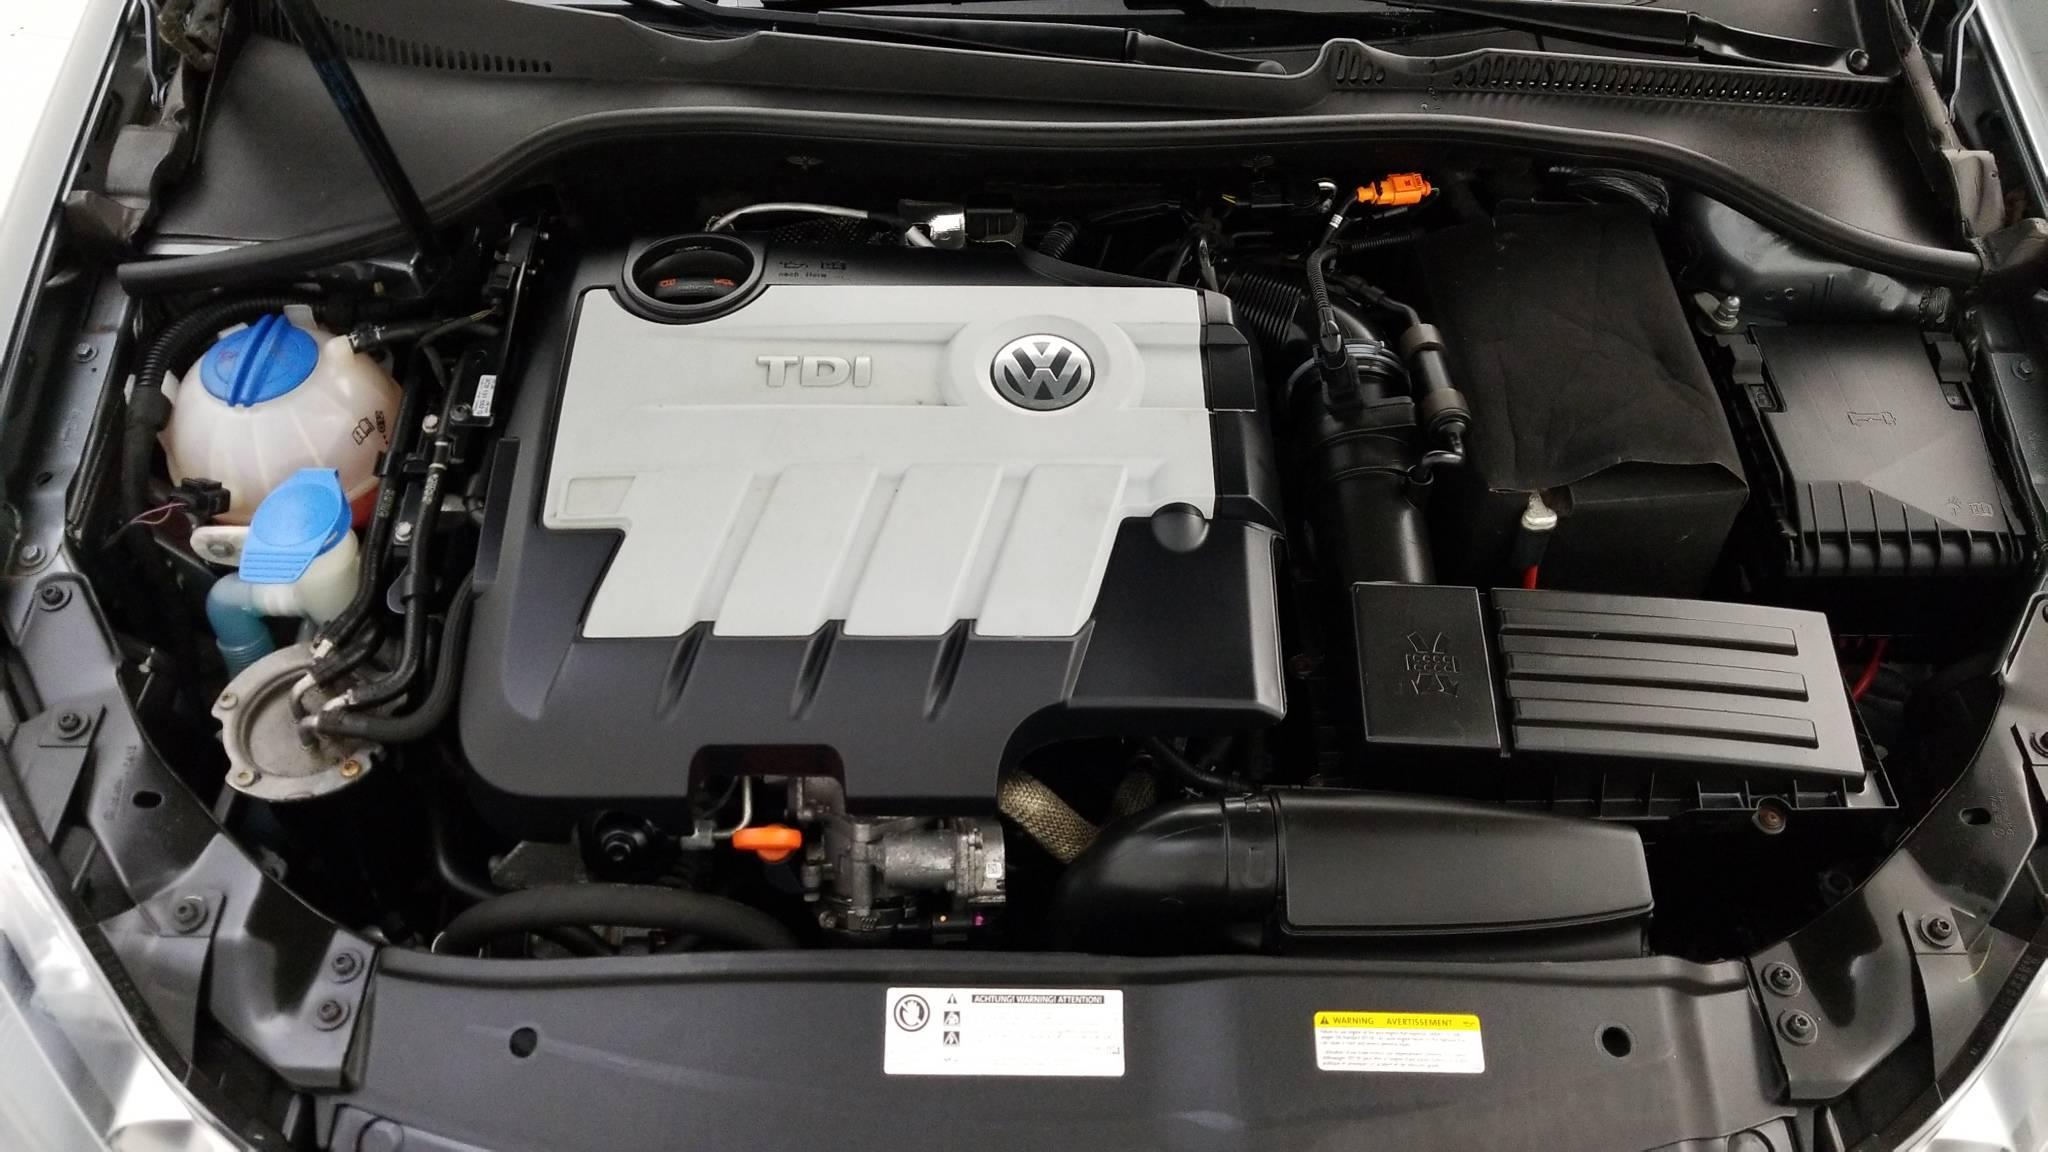 Pre-Owned 2013 Volkswagen Jetta TDI